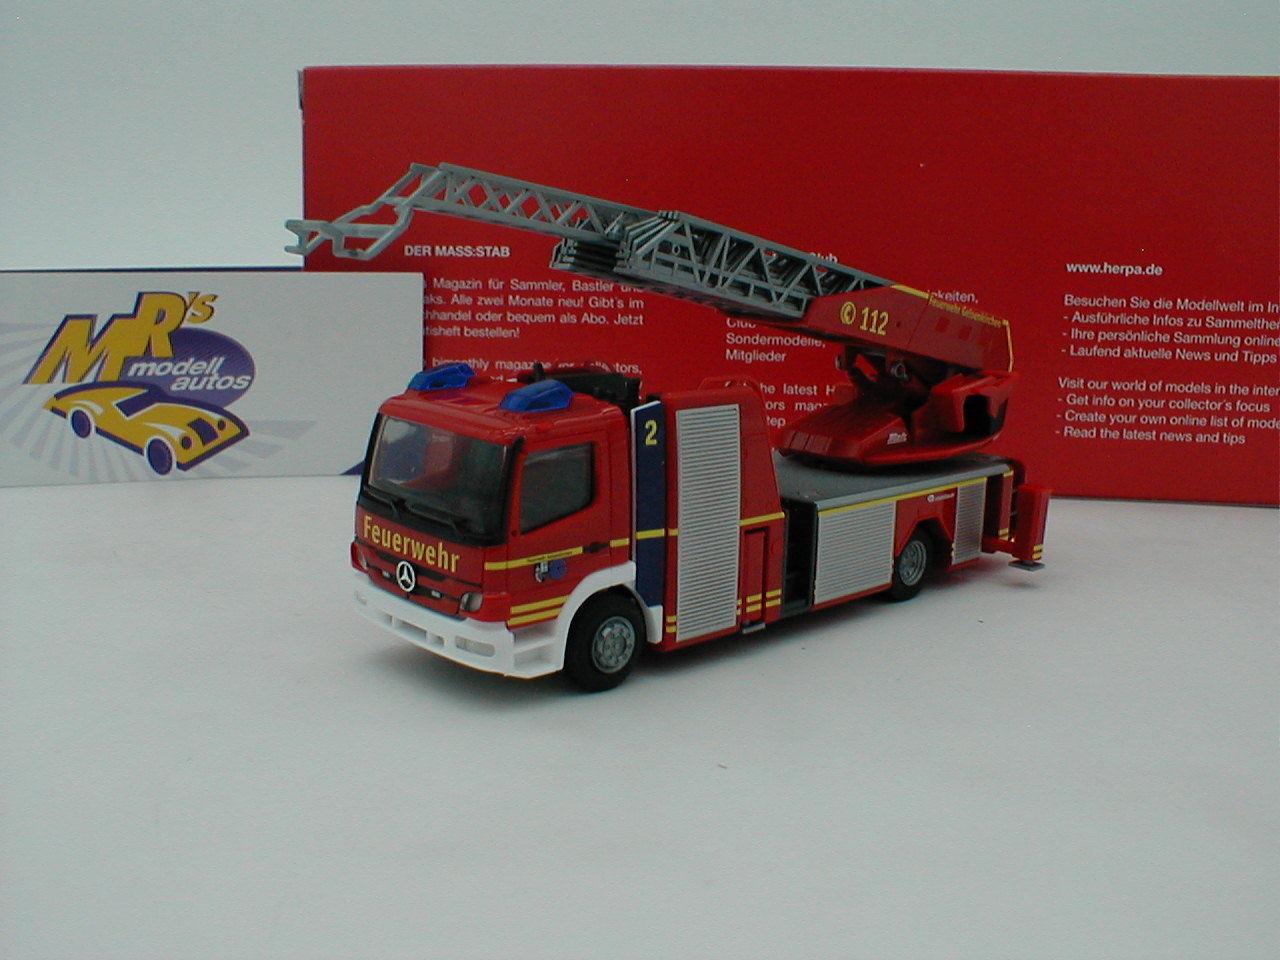 Herpa 093729-MB Atego roses Bauer Drehleiter  Pompiers Gelsenkirchen  1 87